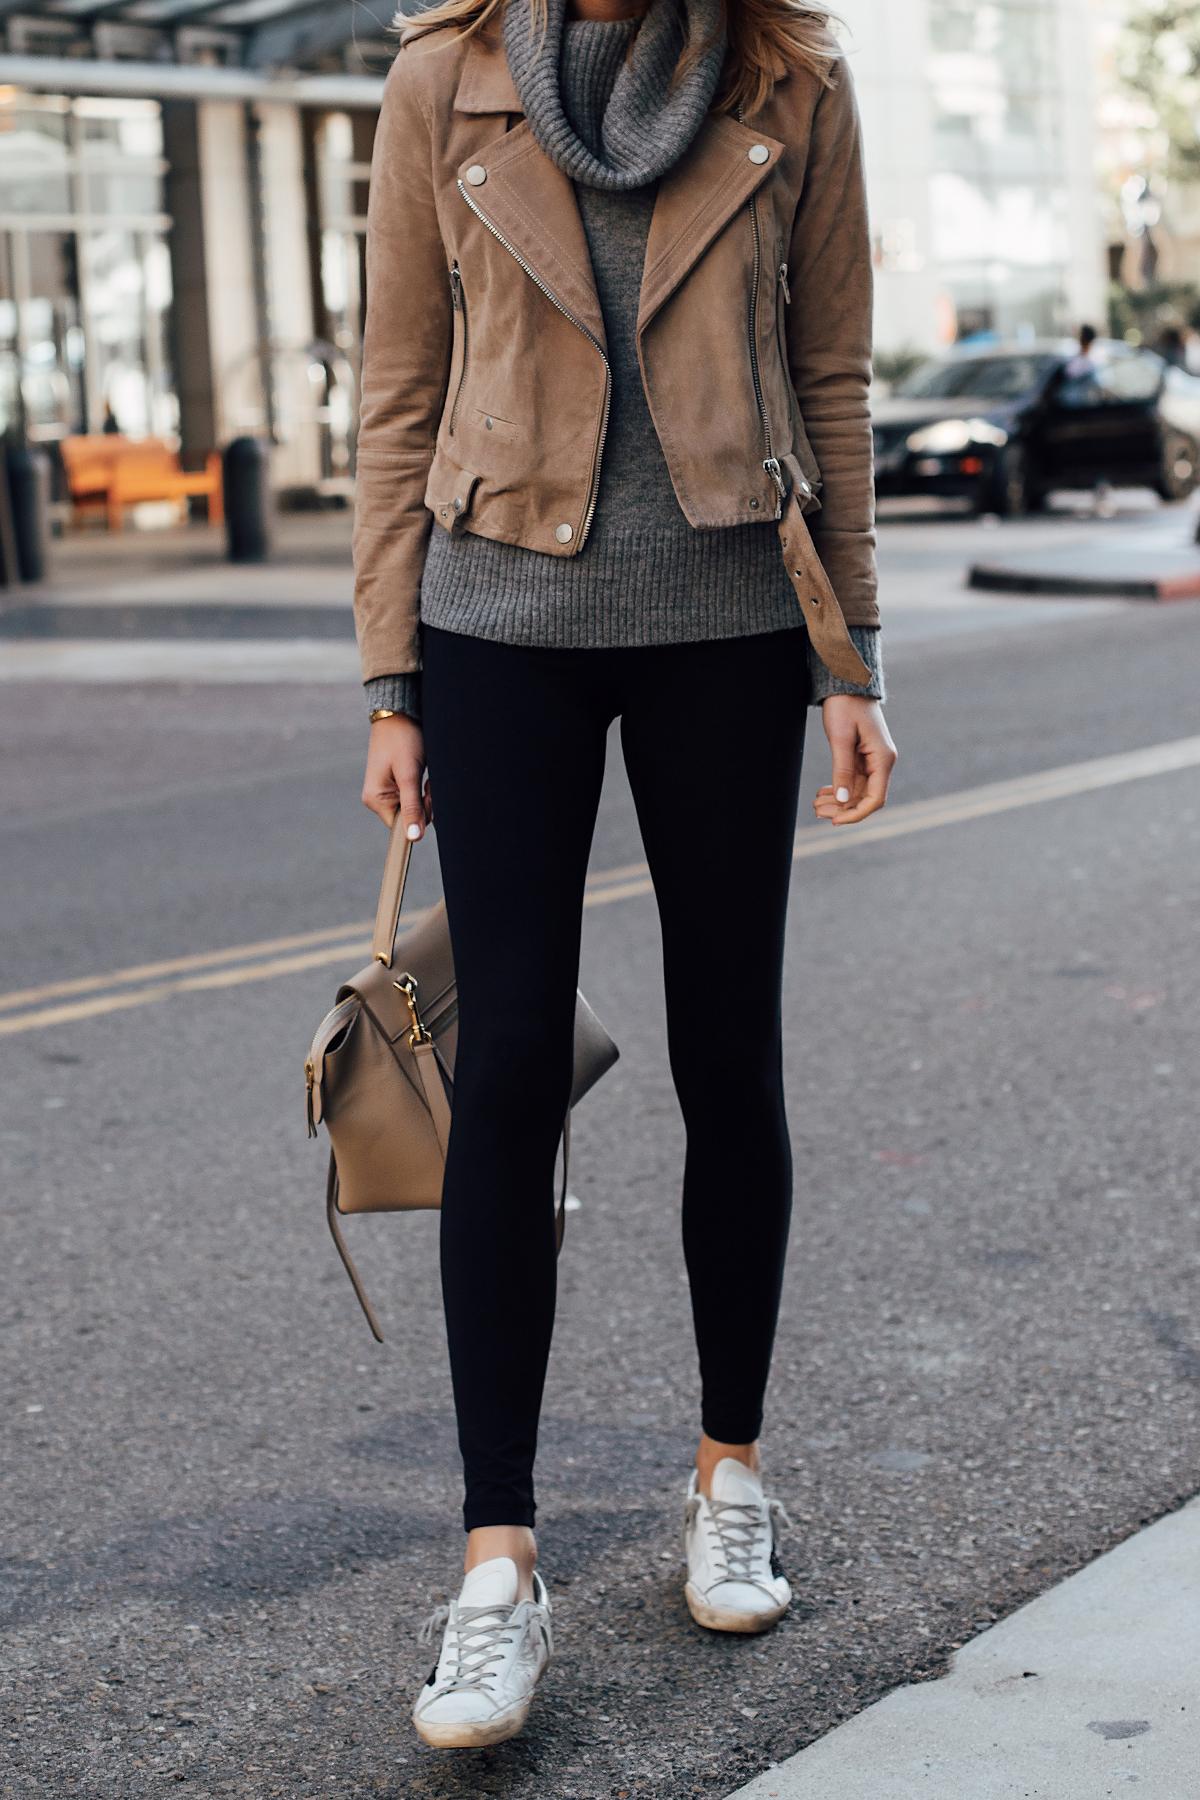 Woman Wearing Blanknyc Tan Suede Moto Jacket Grey Turtleneck Sweater Black Leggings Golden Goose Sneakers Celine Mini Belt Bag Fashion Jackson San Diego Fashion Blogger Street Style